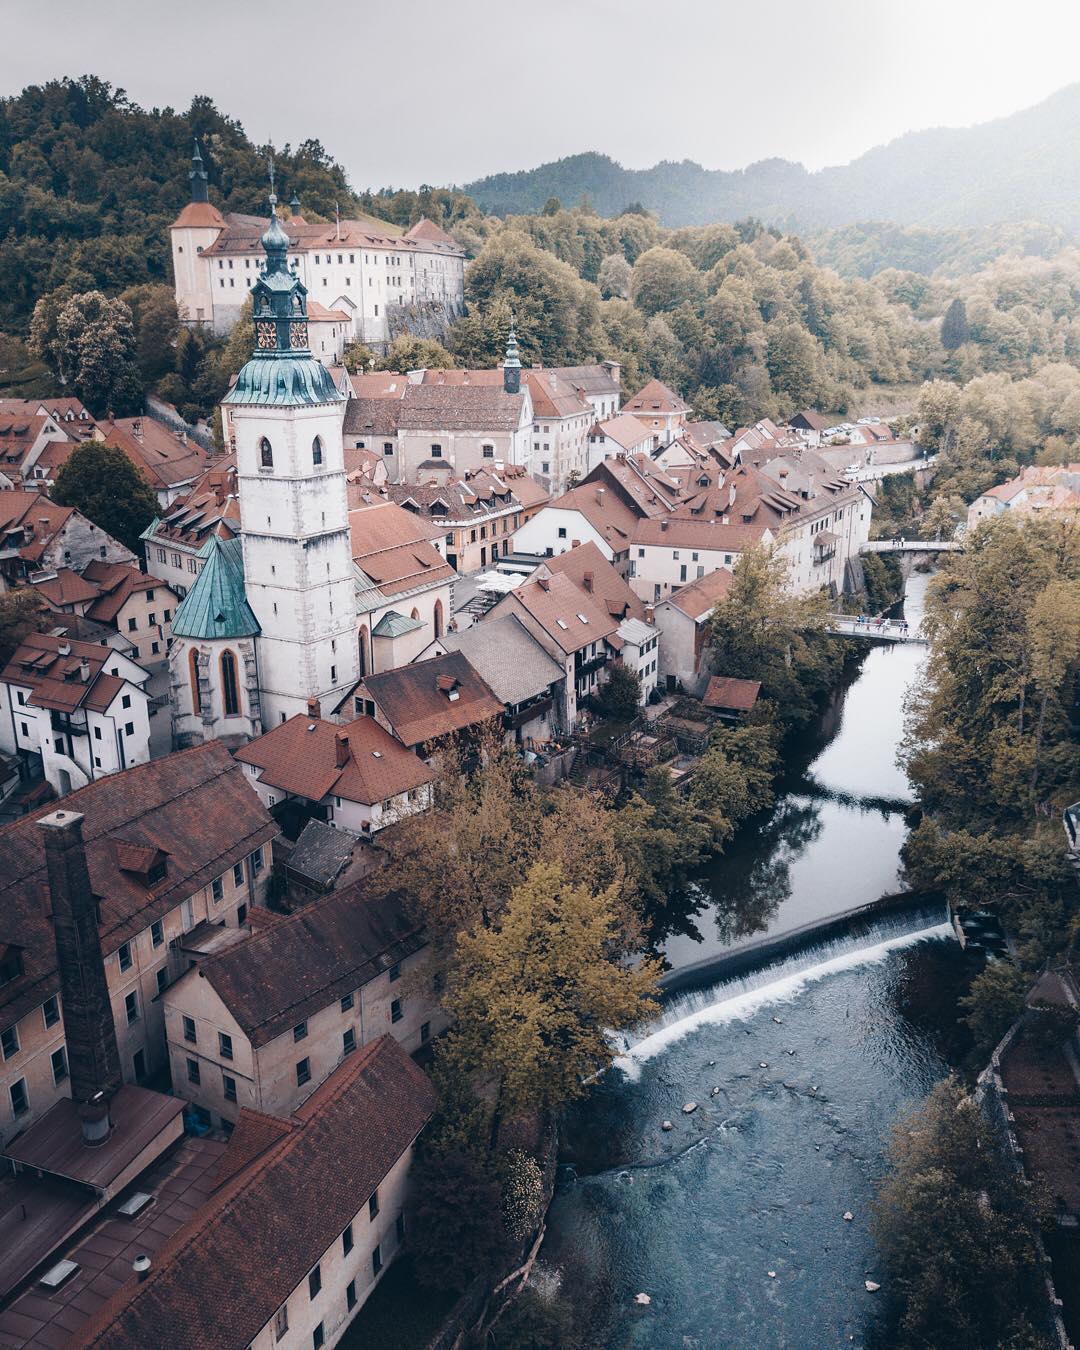 Hey this is @lukas_pousset with my favorite angle of Škofja Loka. This little town just west of Ljubljana was one of my favorite locations along the road!  w/ @ibdansch & @manuela_palmberger  #ifeelslovenia #makenewmemories • • • • • • • #skofjaloka#igslovenia #slovenia_ig #sloveniawithlove #slovenia360 #thisisslovenia #visitslovenia #slovenia #topsloveniaphoto #suspensionbridge #tourism #beautifuldestinations #woowvisuals #artofvisuals #traveleurope #travel #backpack #roadtrip #destinationideas #skofja #town